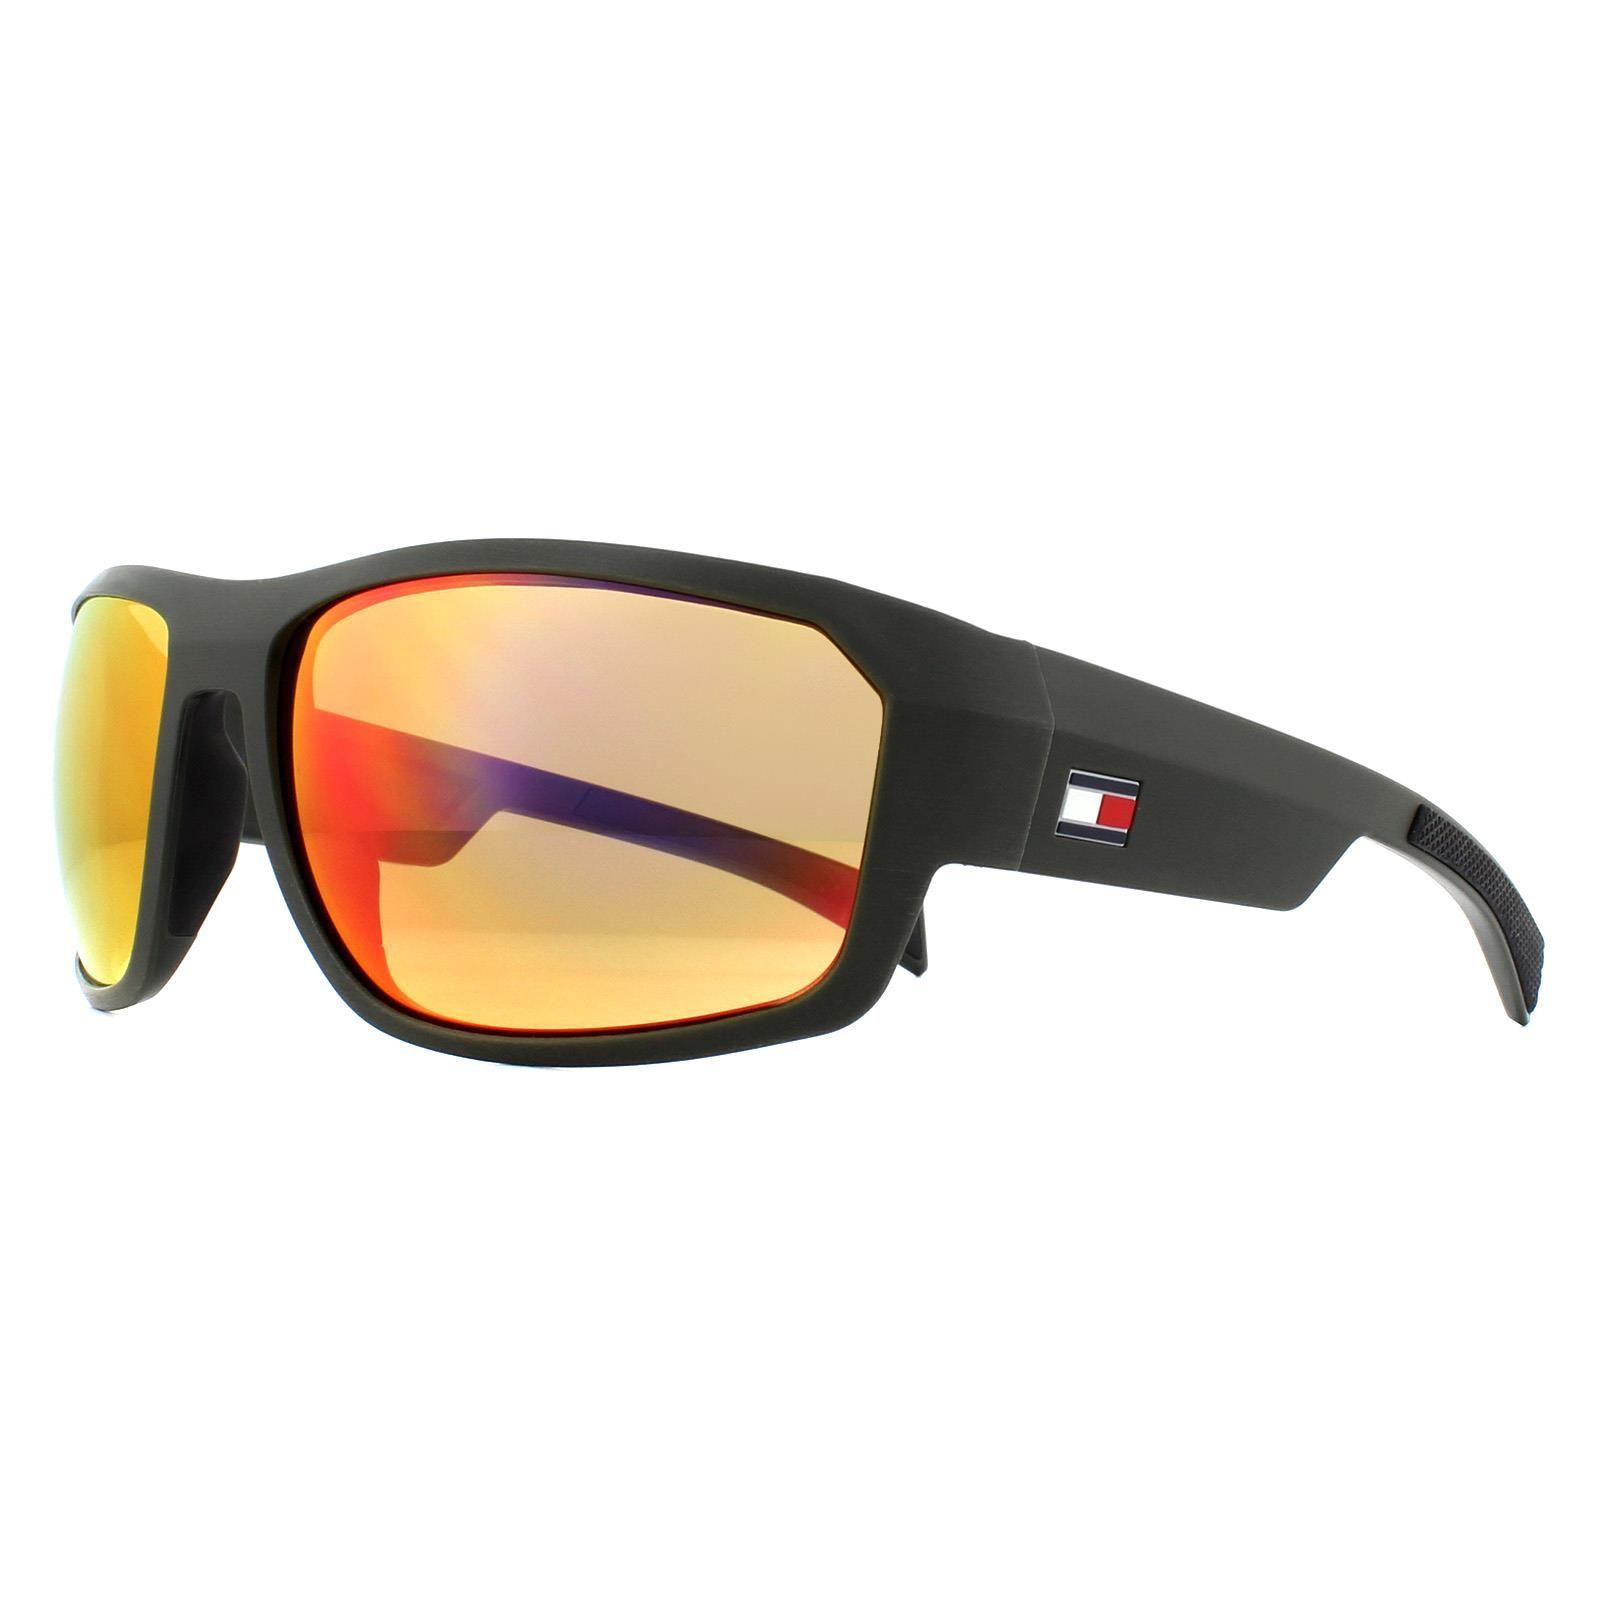 Tommy Hilfiger Sunglasses TH 1722/S WCN BJ Grey Black Dark Brown Infrared